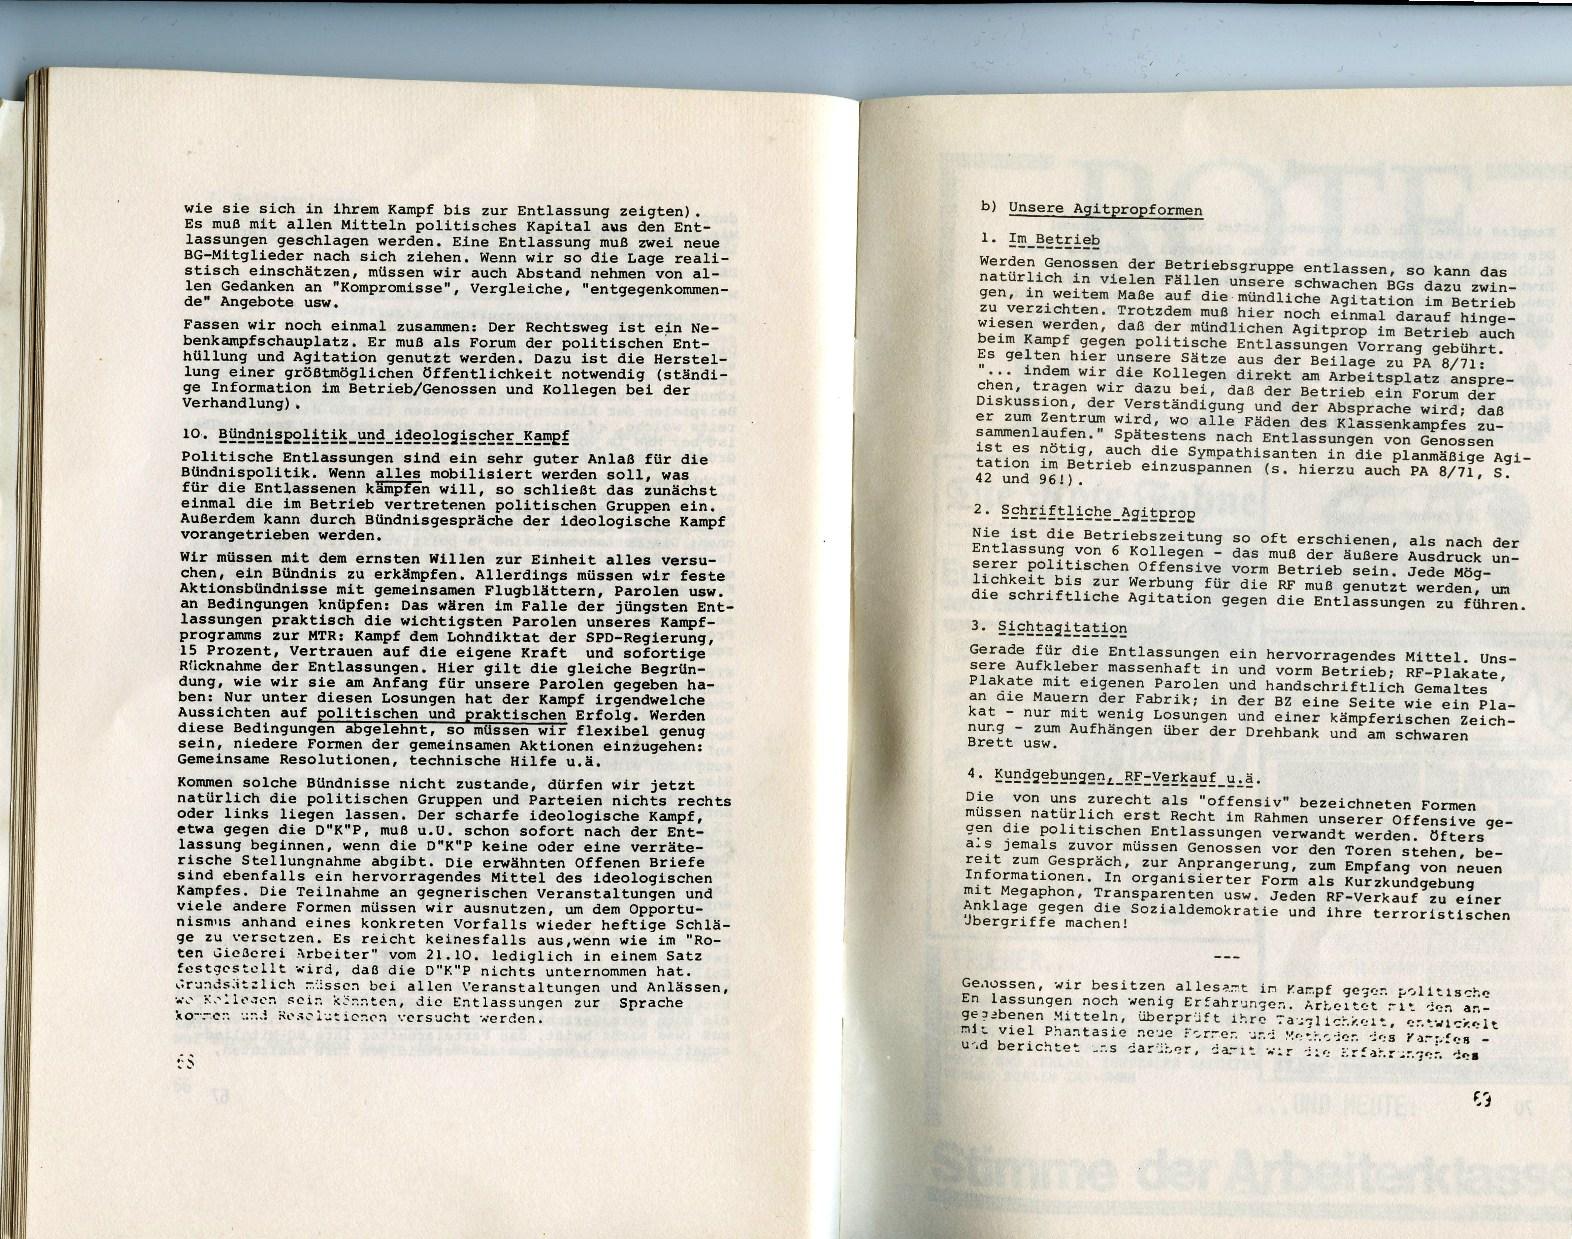 ZB_Parteiarbeiter_1971_09_35